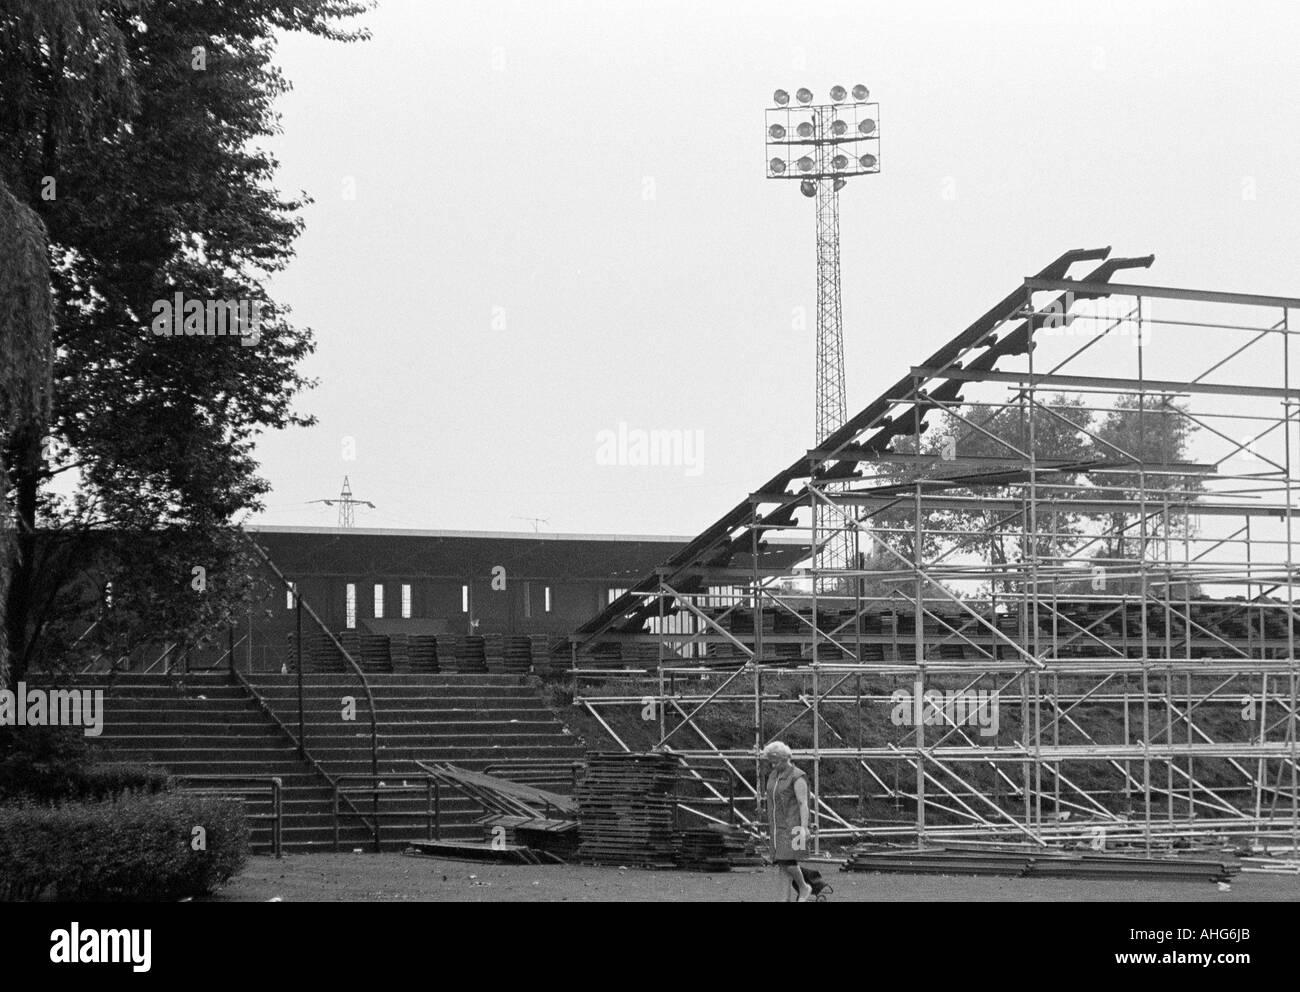 football, Bundesliga, 1969/1970, Glueckaufkampfbahn Stadium in Gelsenkirchen, stadium of FC Schalke 04, additional stand seats - Stock Image